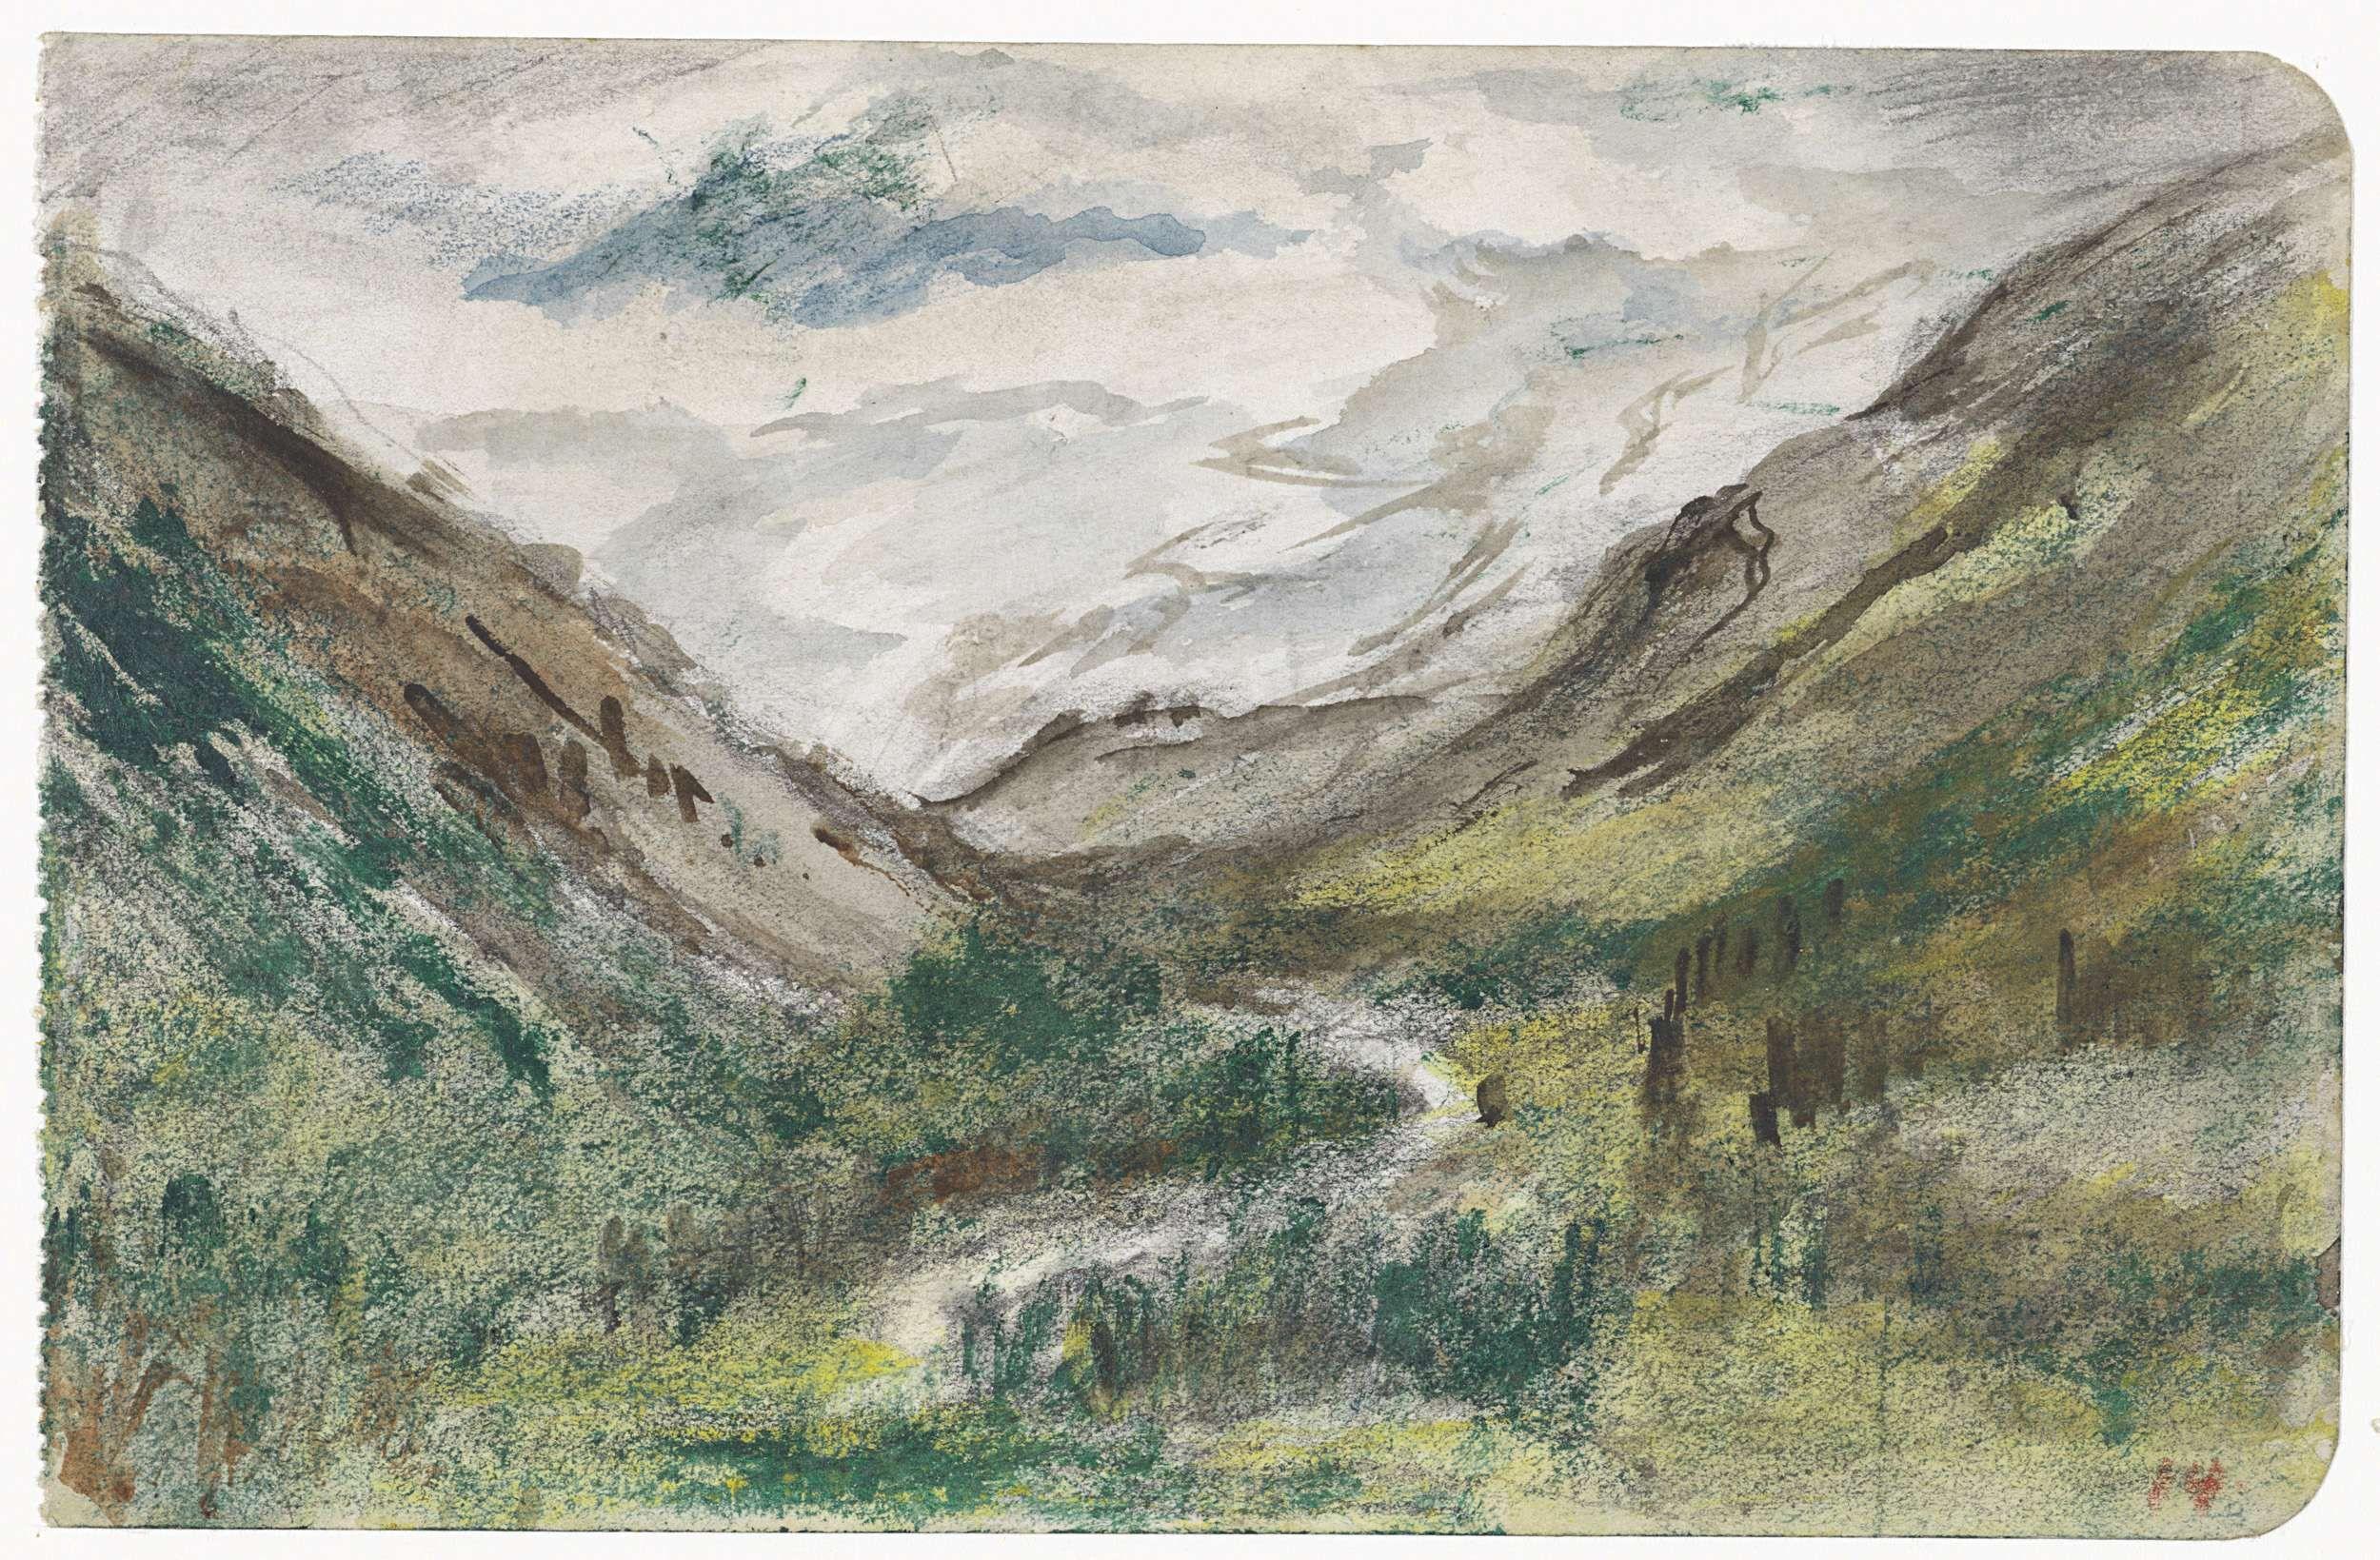 Jozef Israëls | Dal met begroeide bergen, Jozef Israëls, 1834 - 1911 |